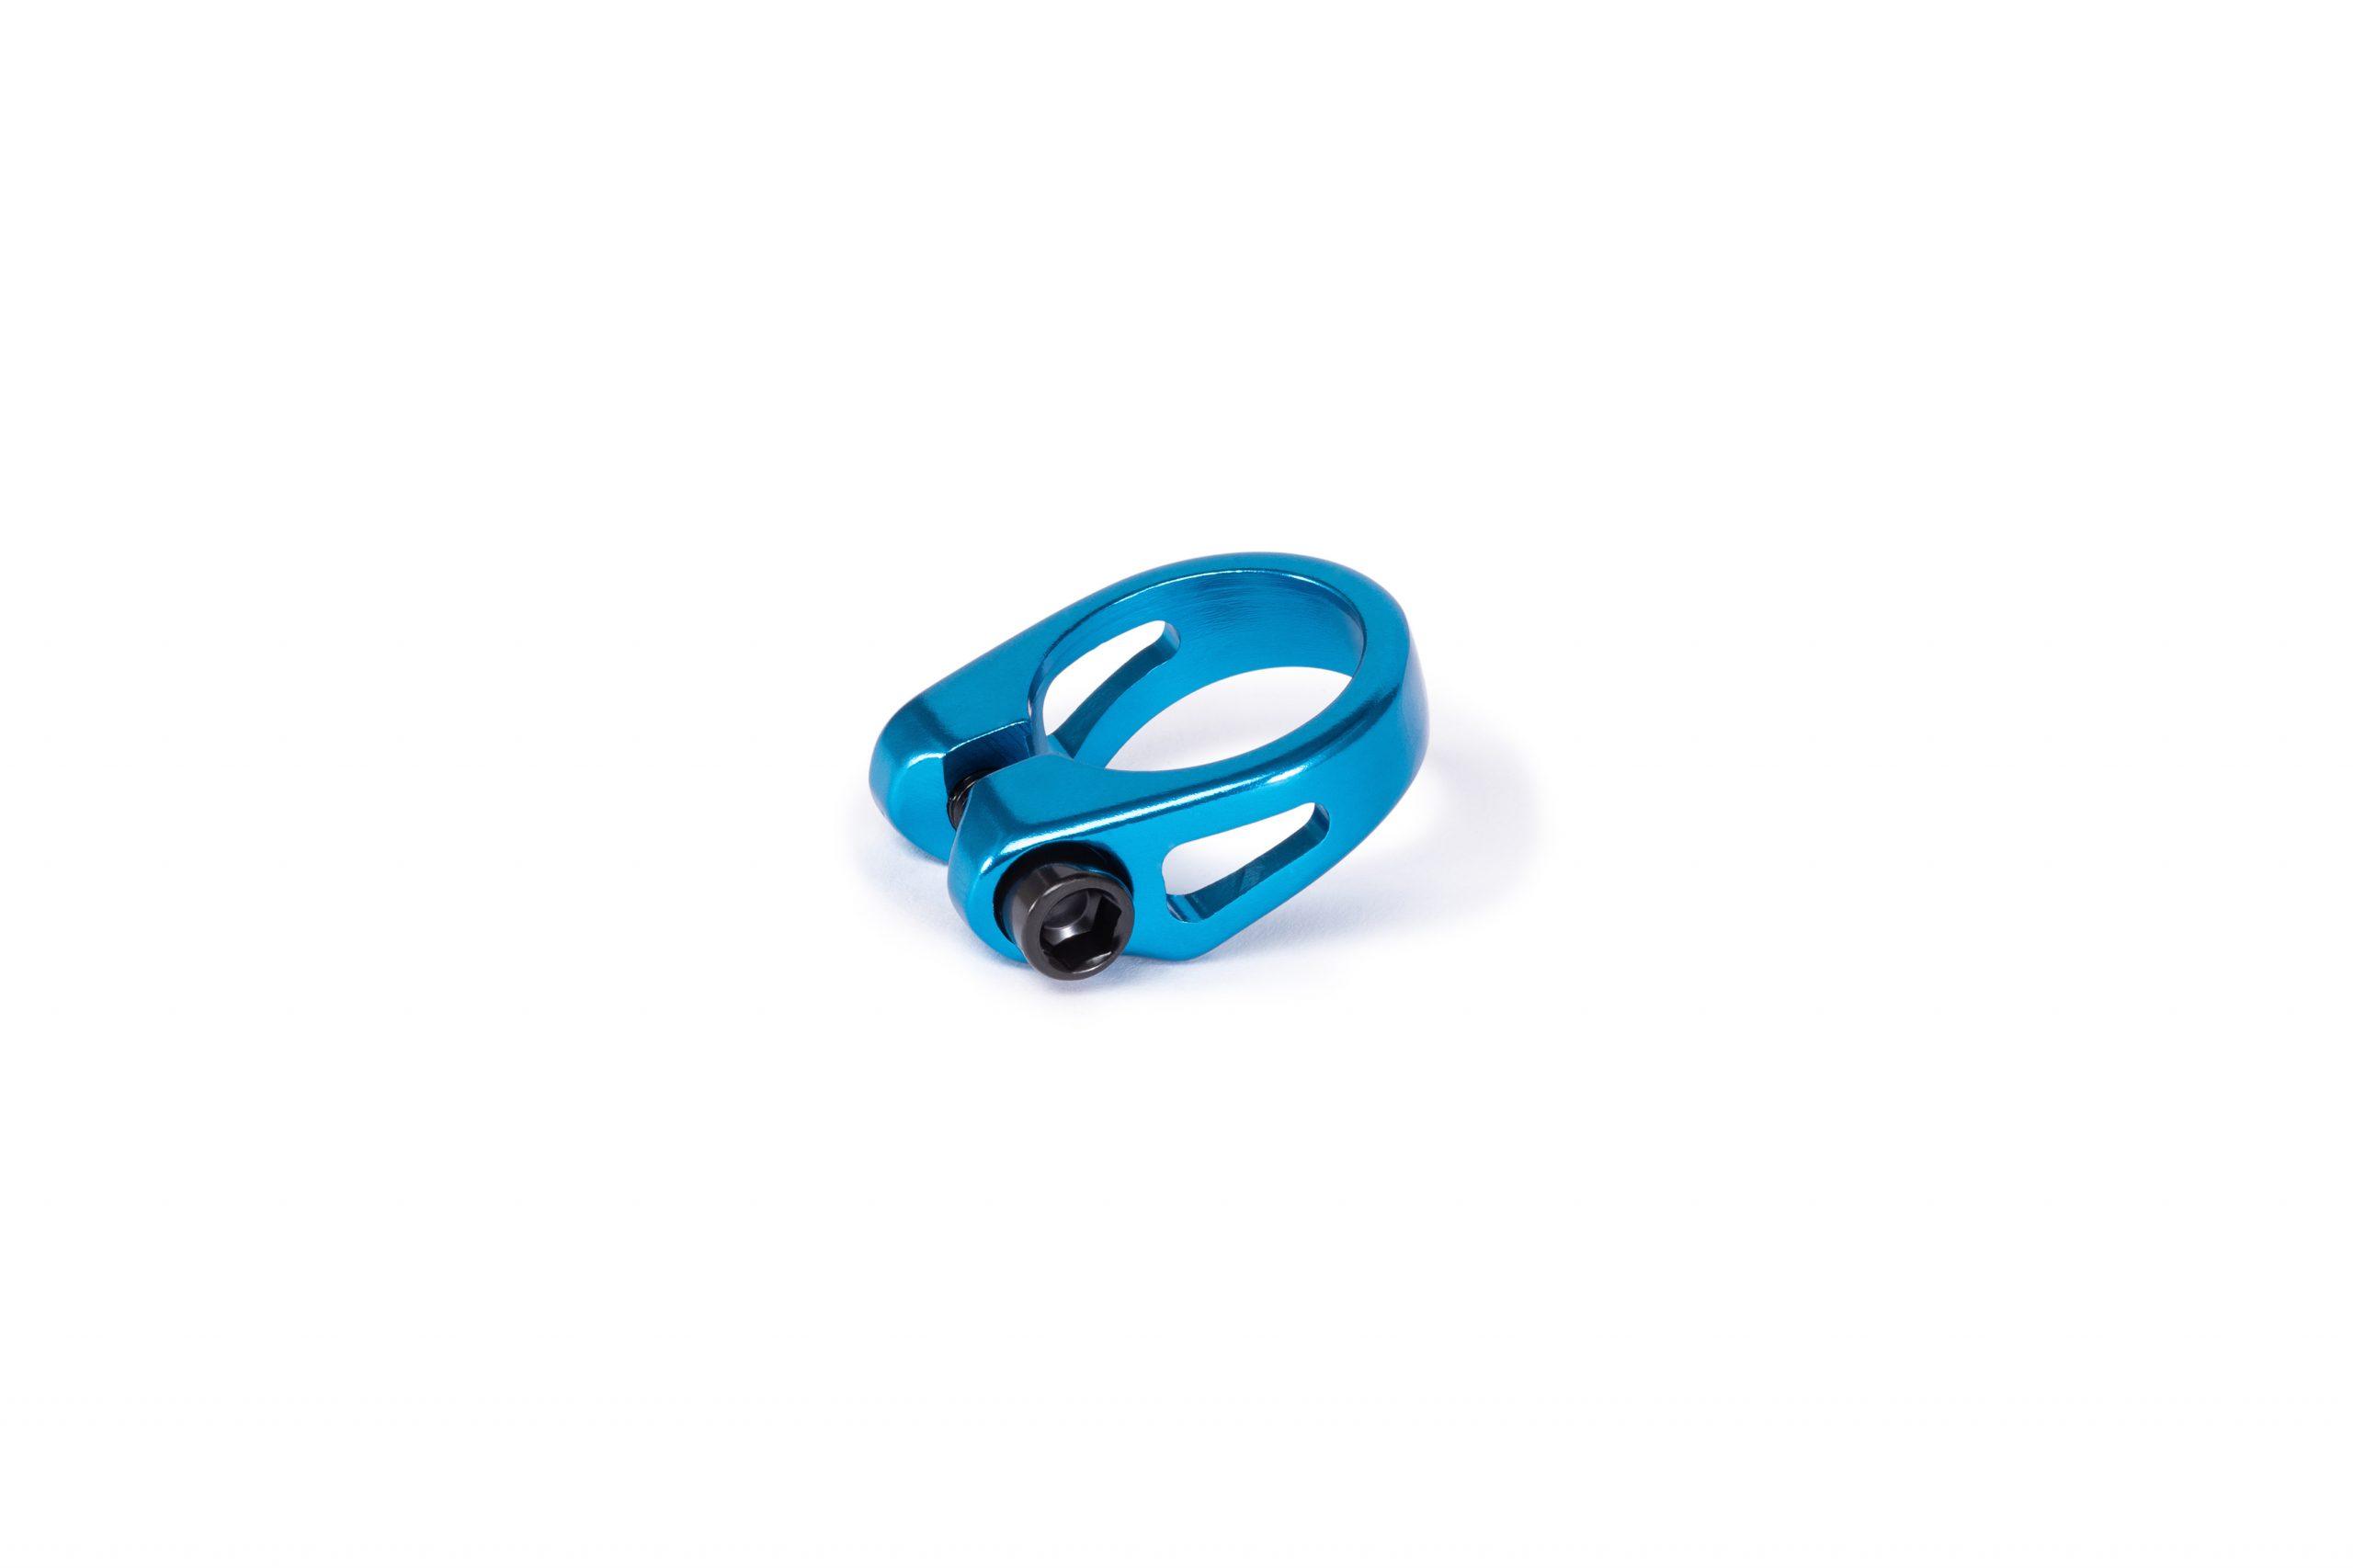 Salt_AM_seat_clamp_blue-02